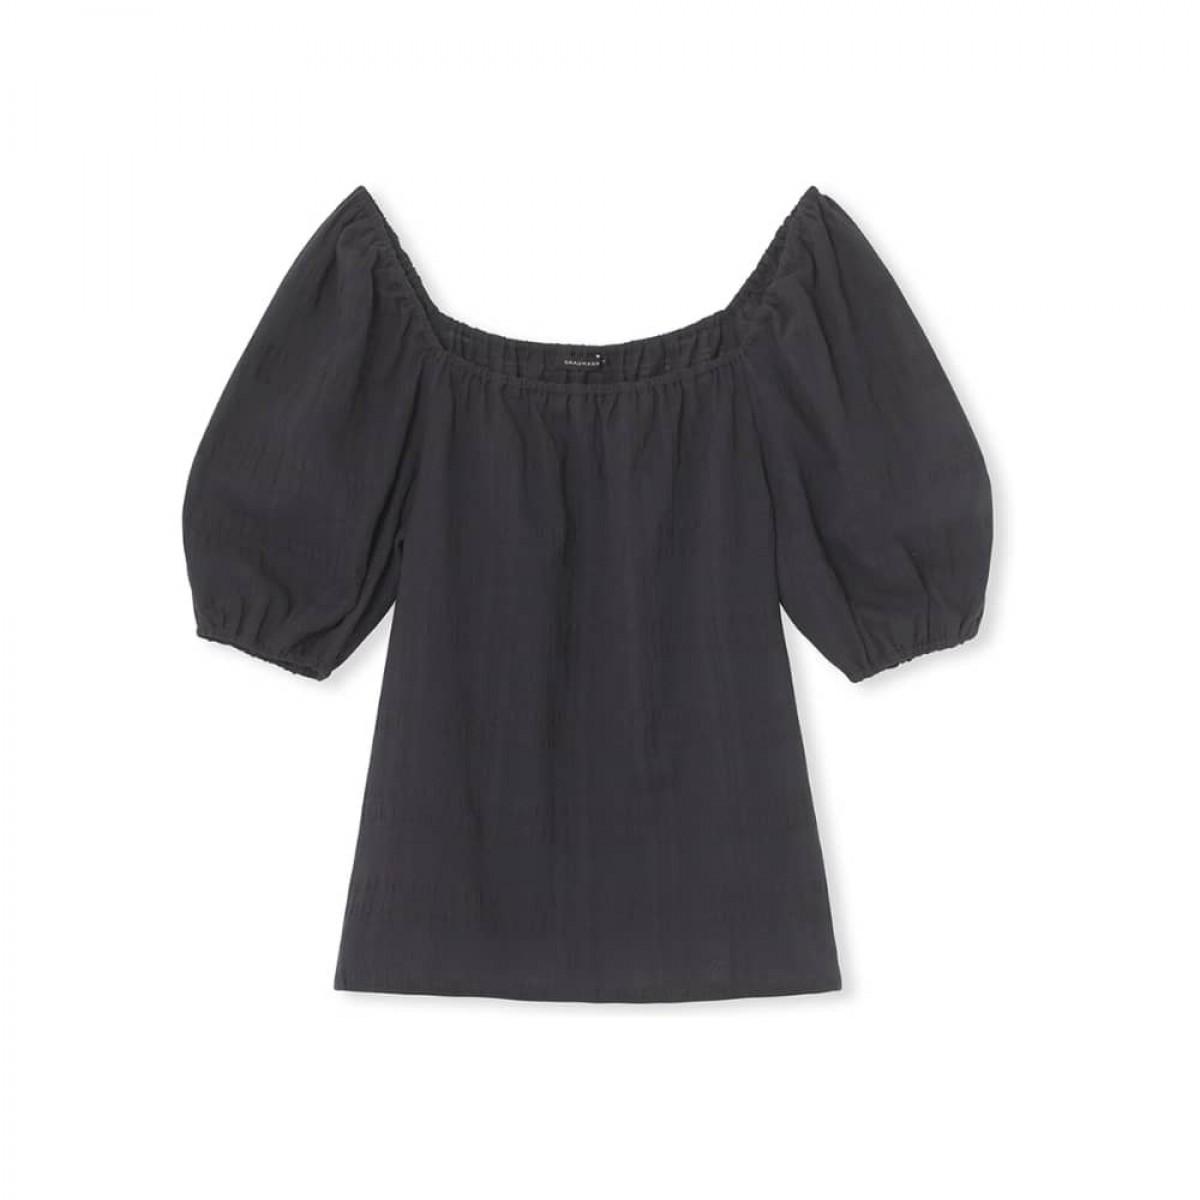 flo shirt top - black - front